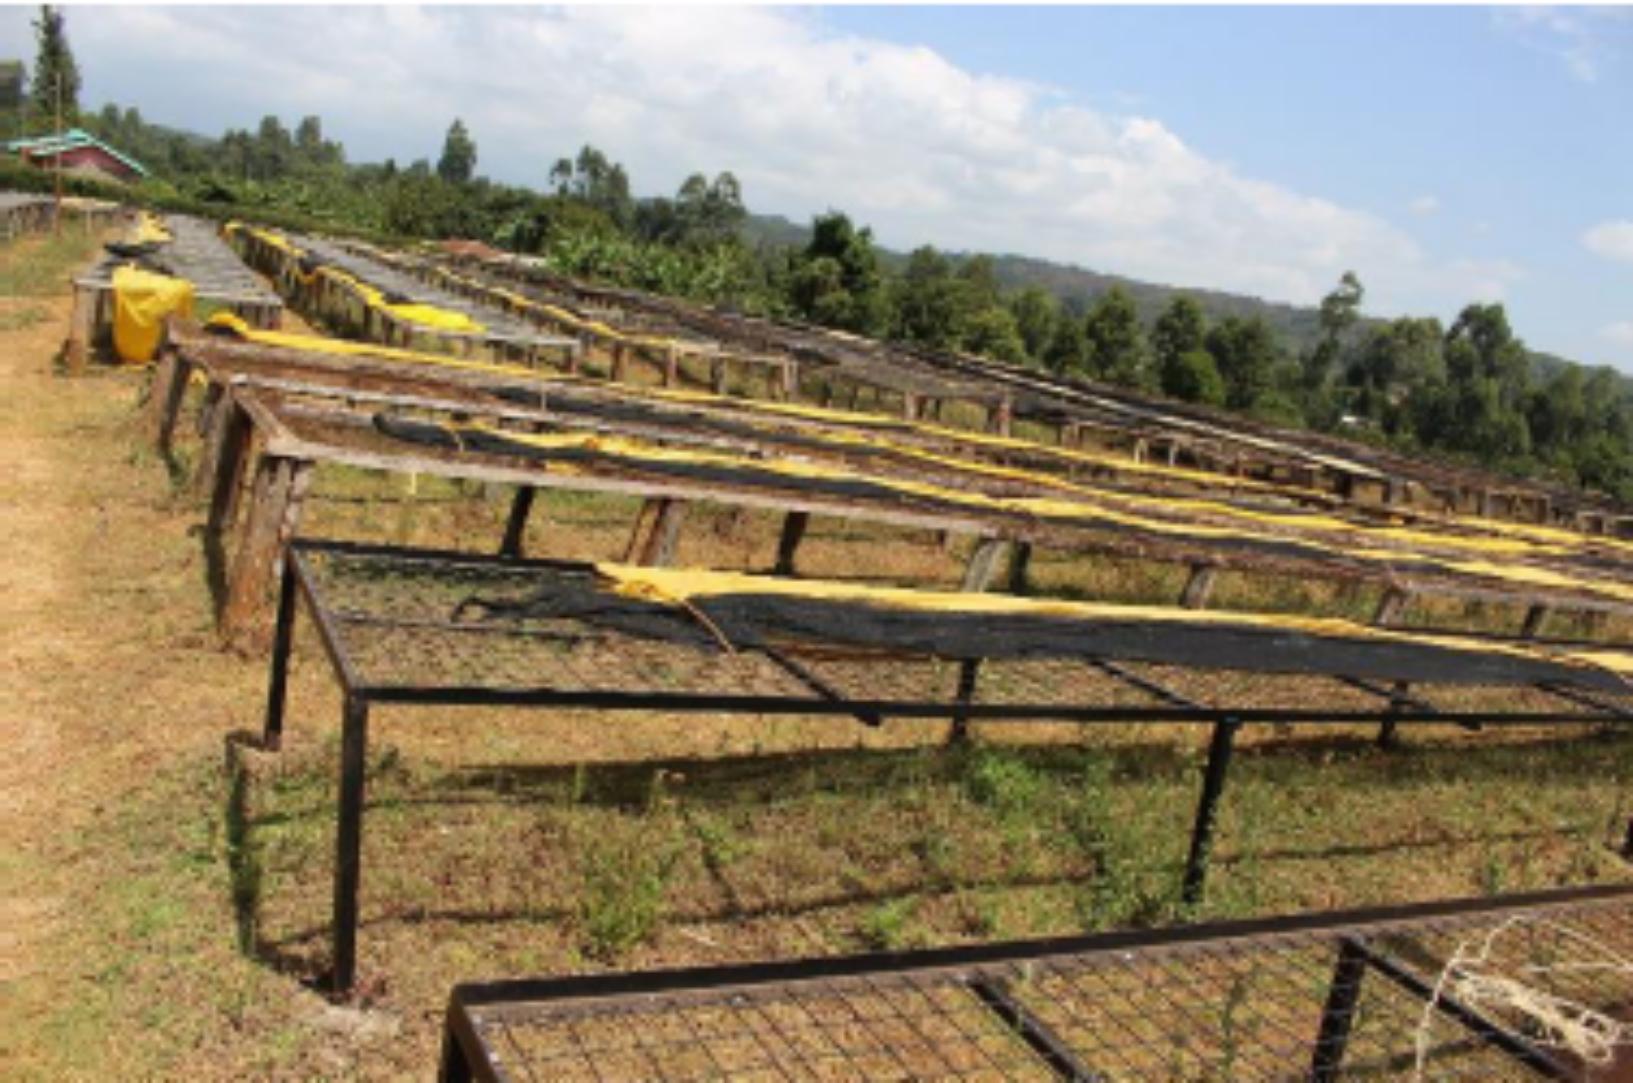 【500g】ケニア カビンガラ ~kenya kabingara wet mill~